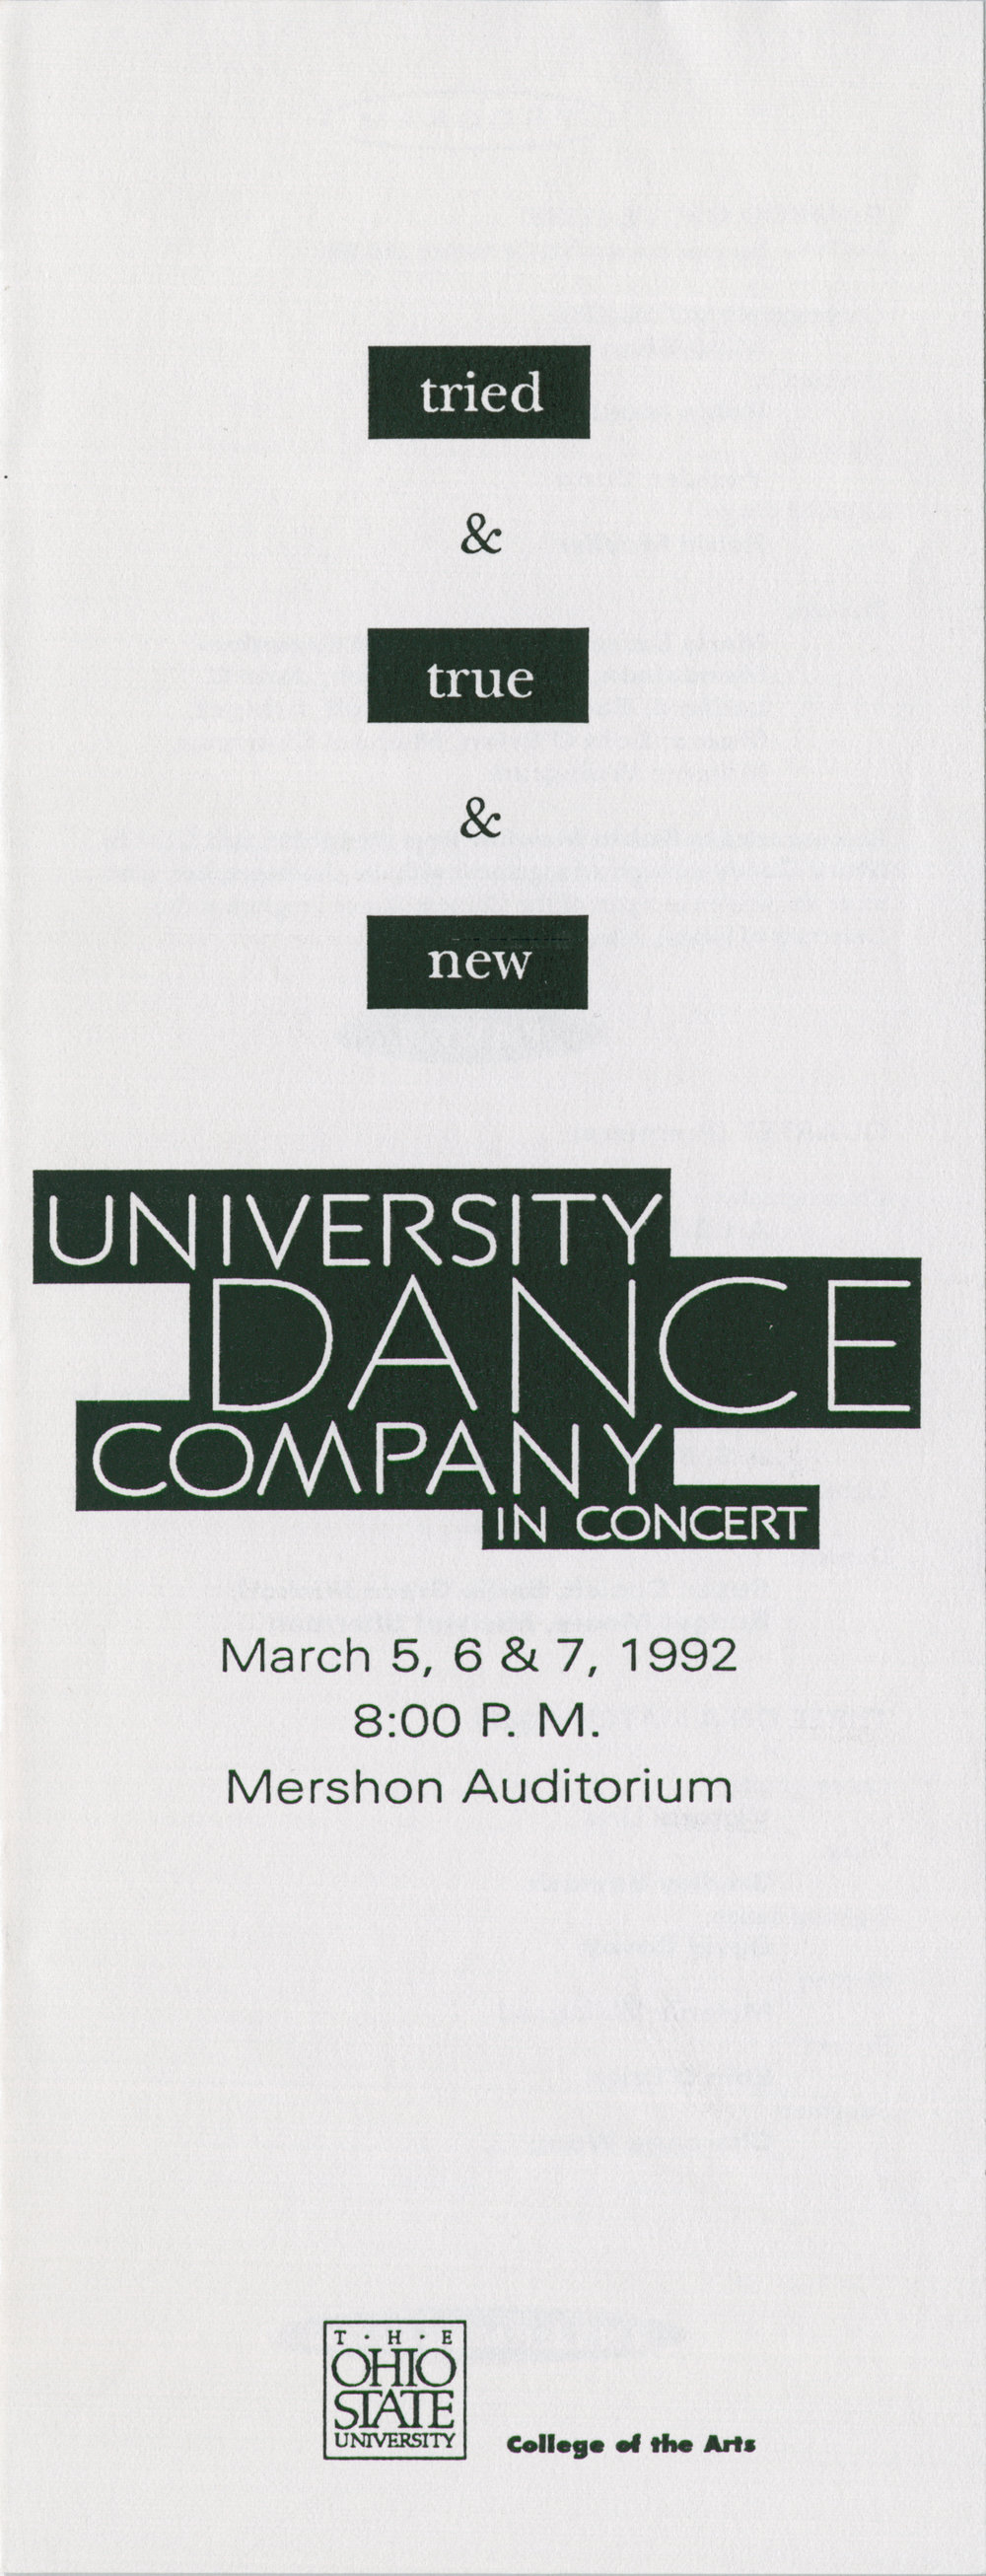 UDC_1992.1_DancePrograms-023-001.jpg